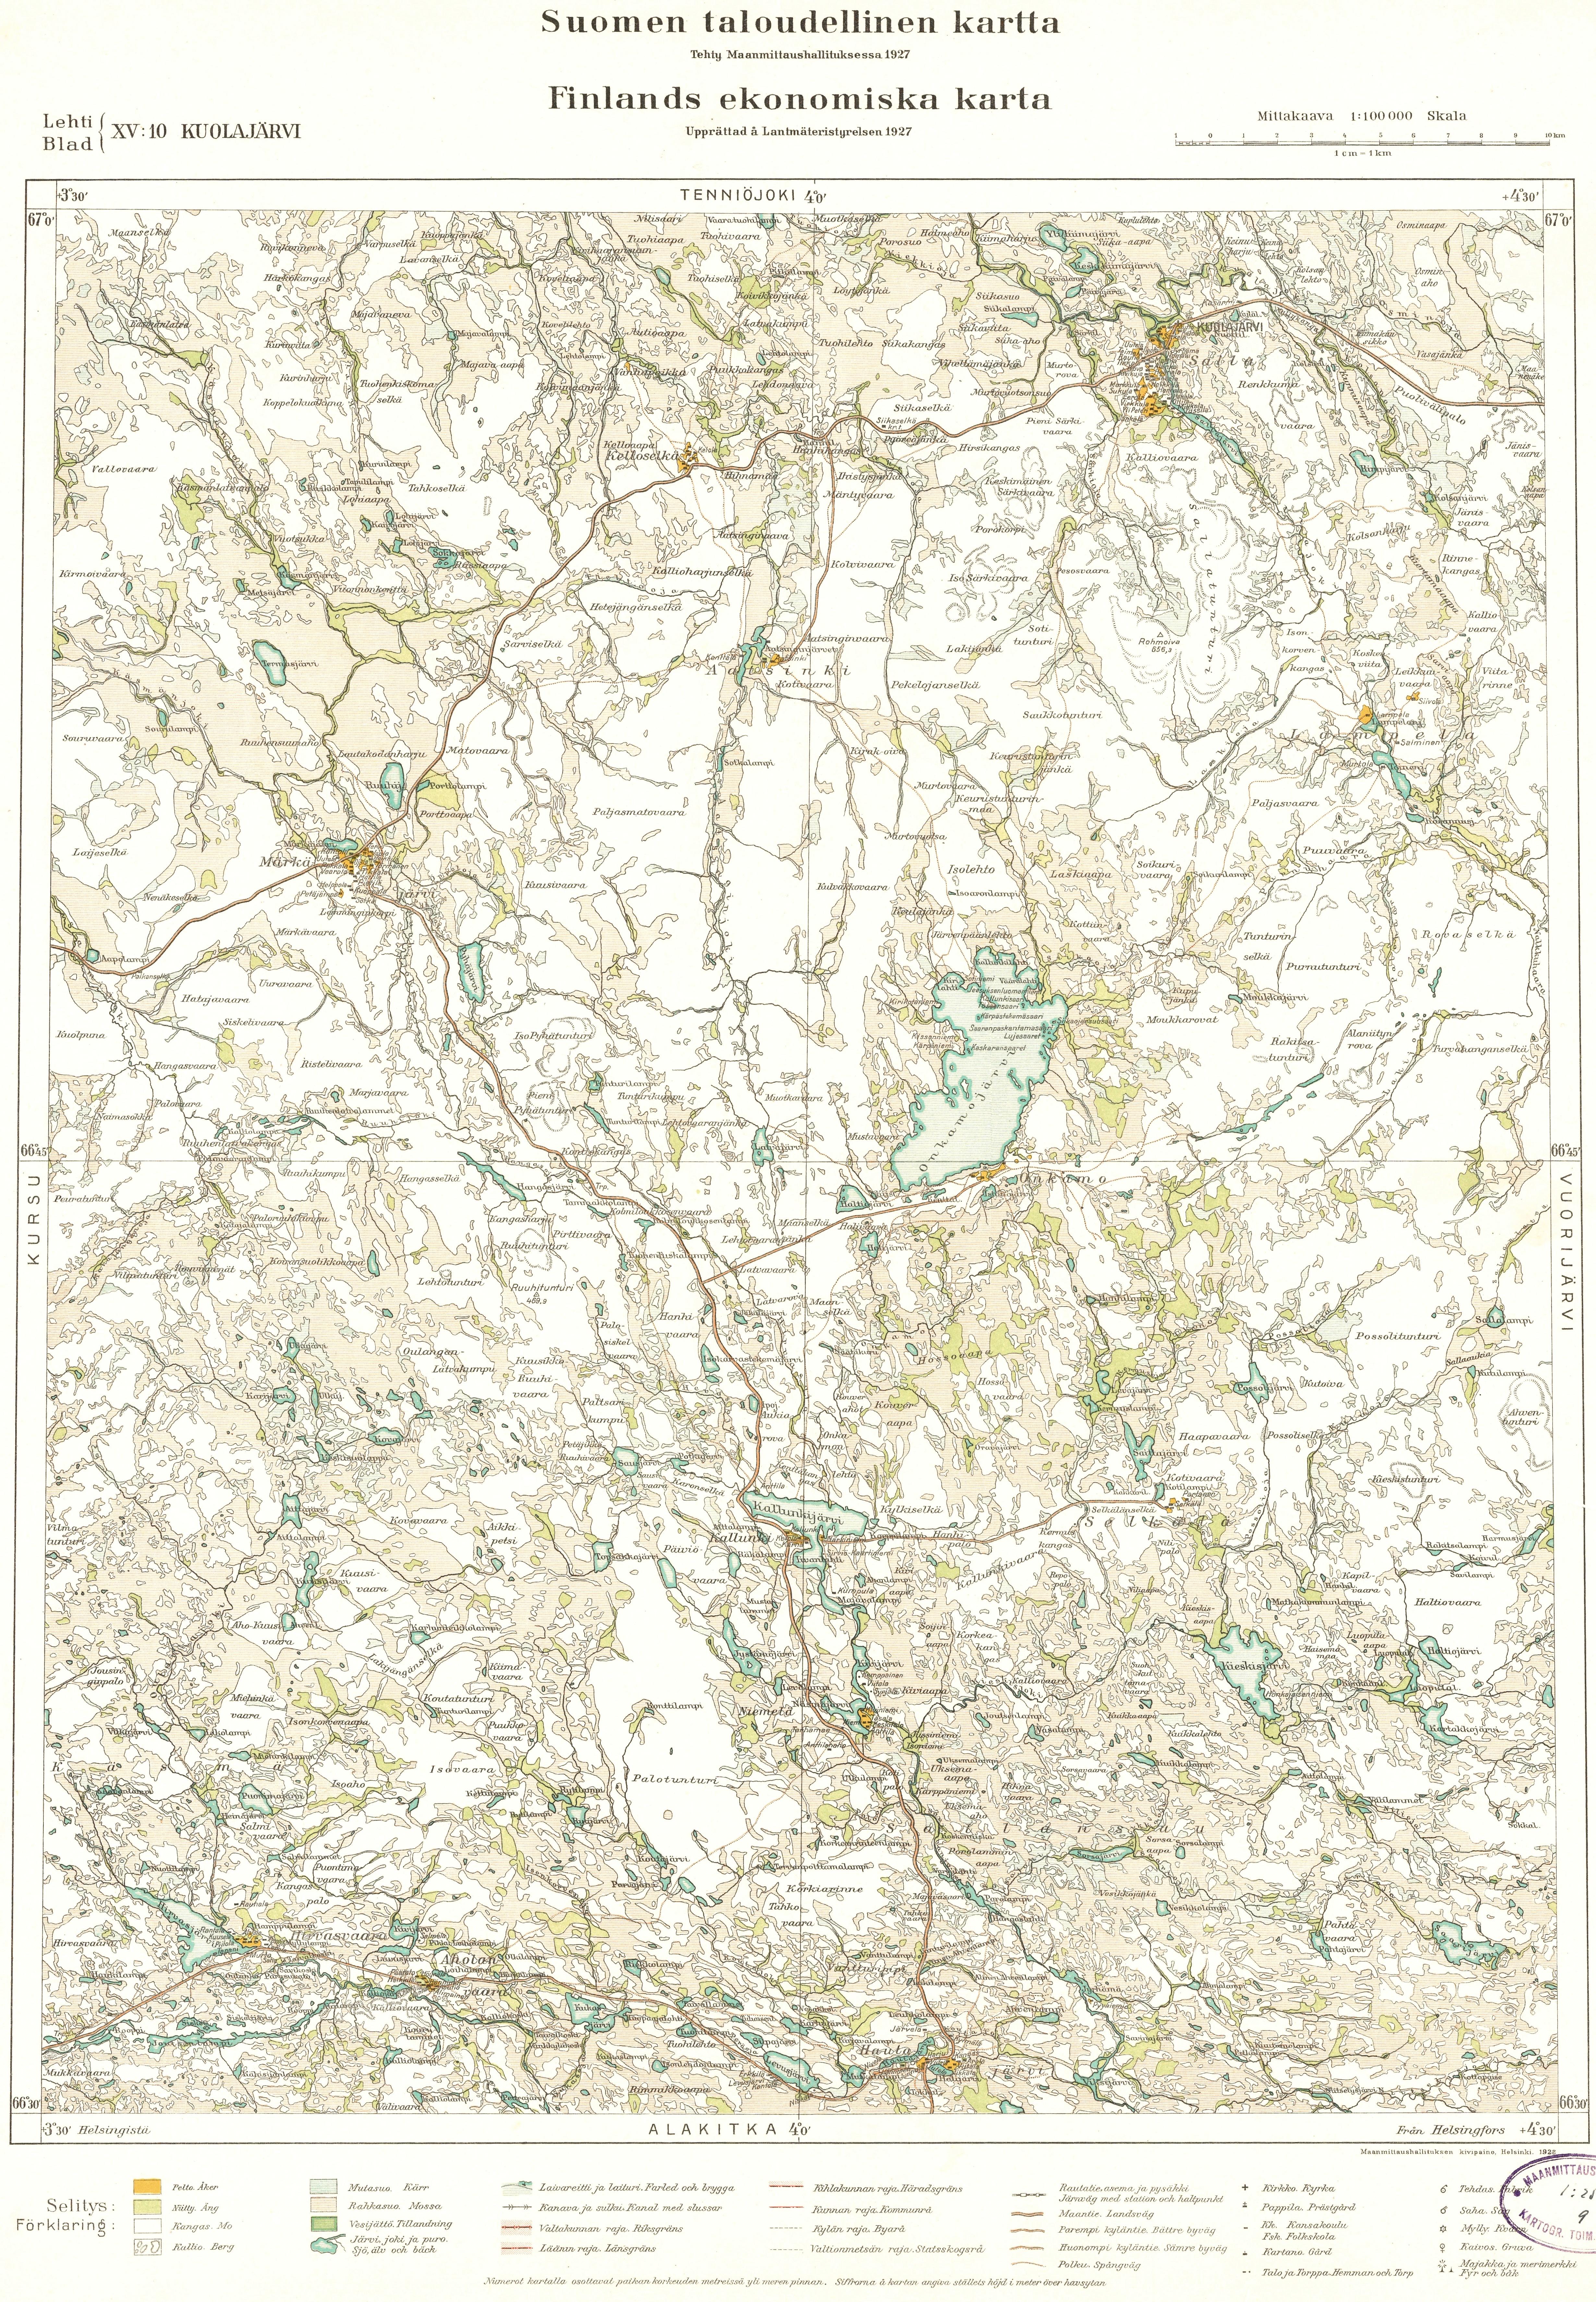 Kuopion karttapalvelu